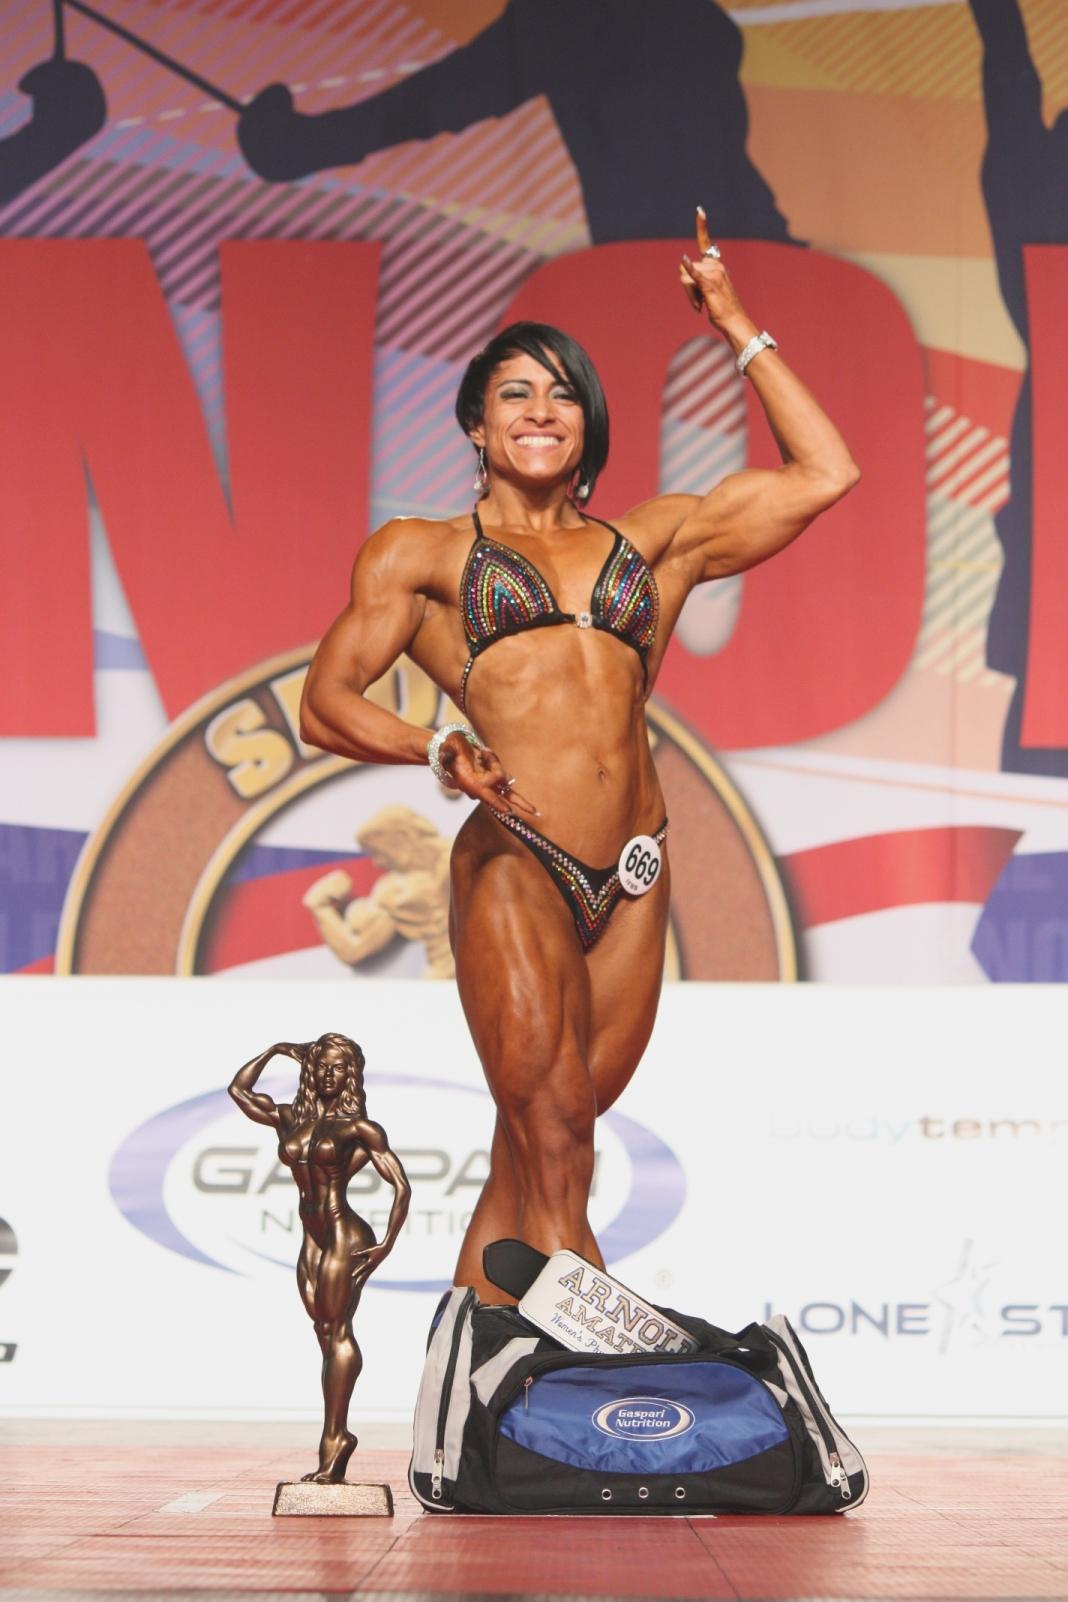 Women's Physique – Claudia de Leon Pardo of Mexico (669)